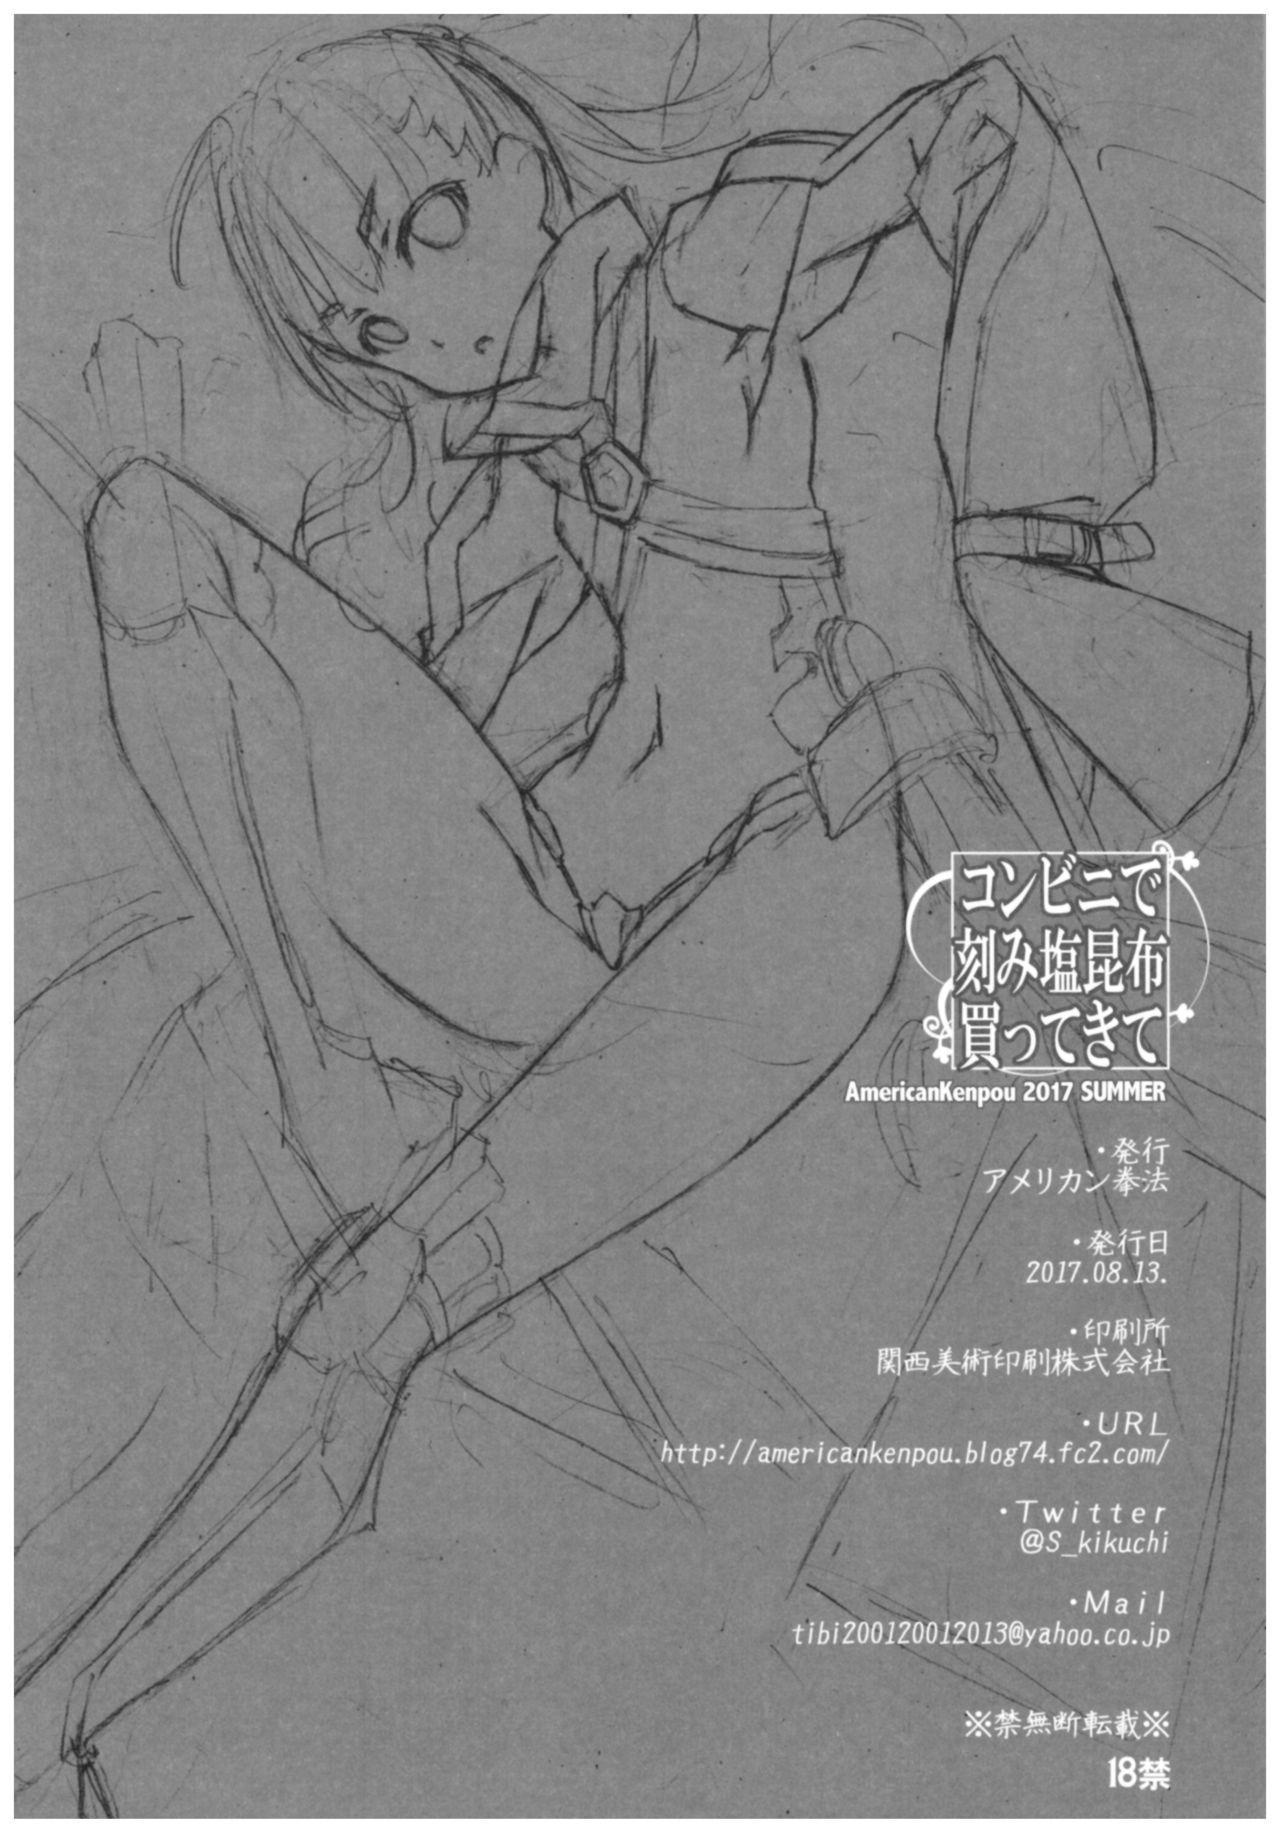 Conveni de Kizami Shiokonbu Kattekite 36